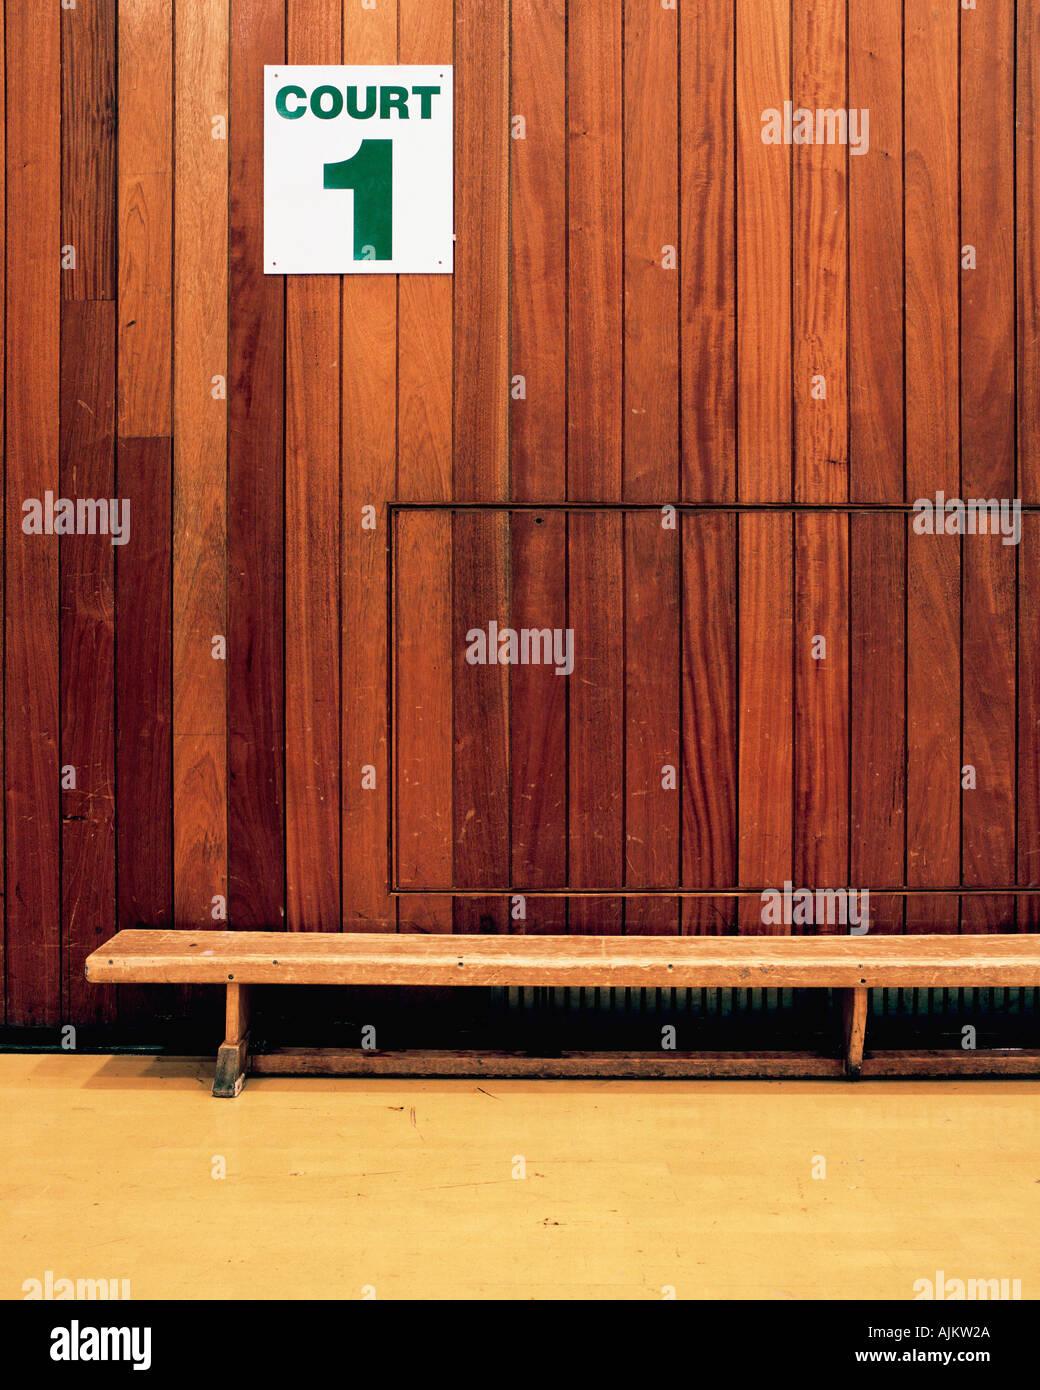 Vaciar la cancha deportiva Imagen De Stock